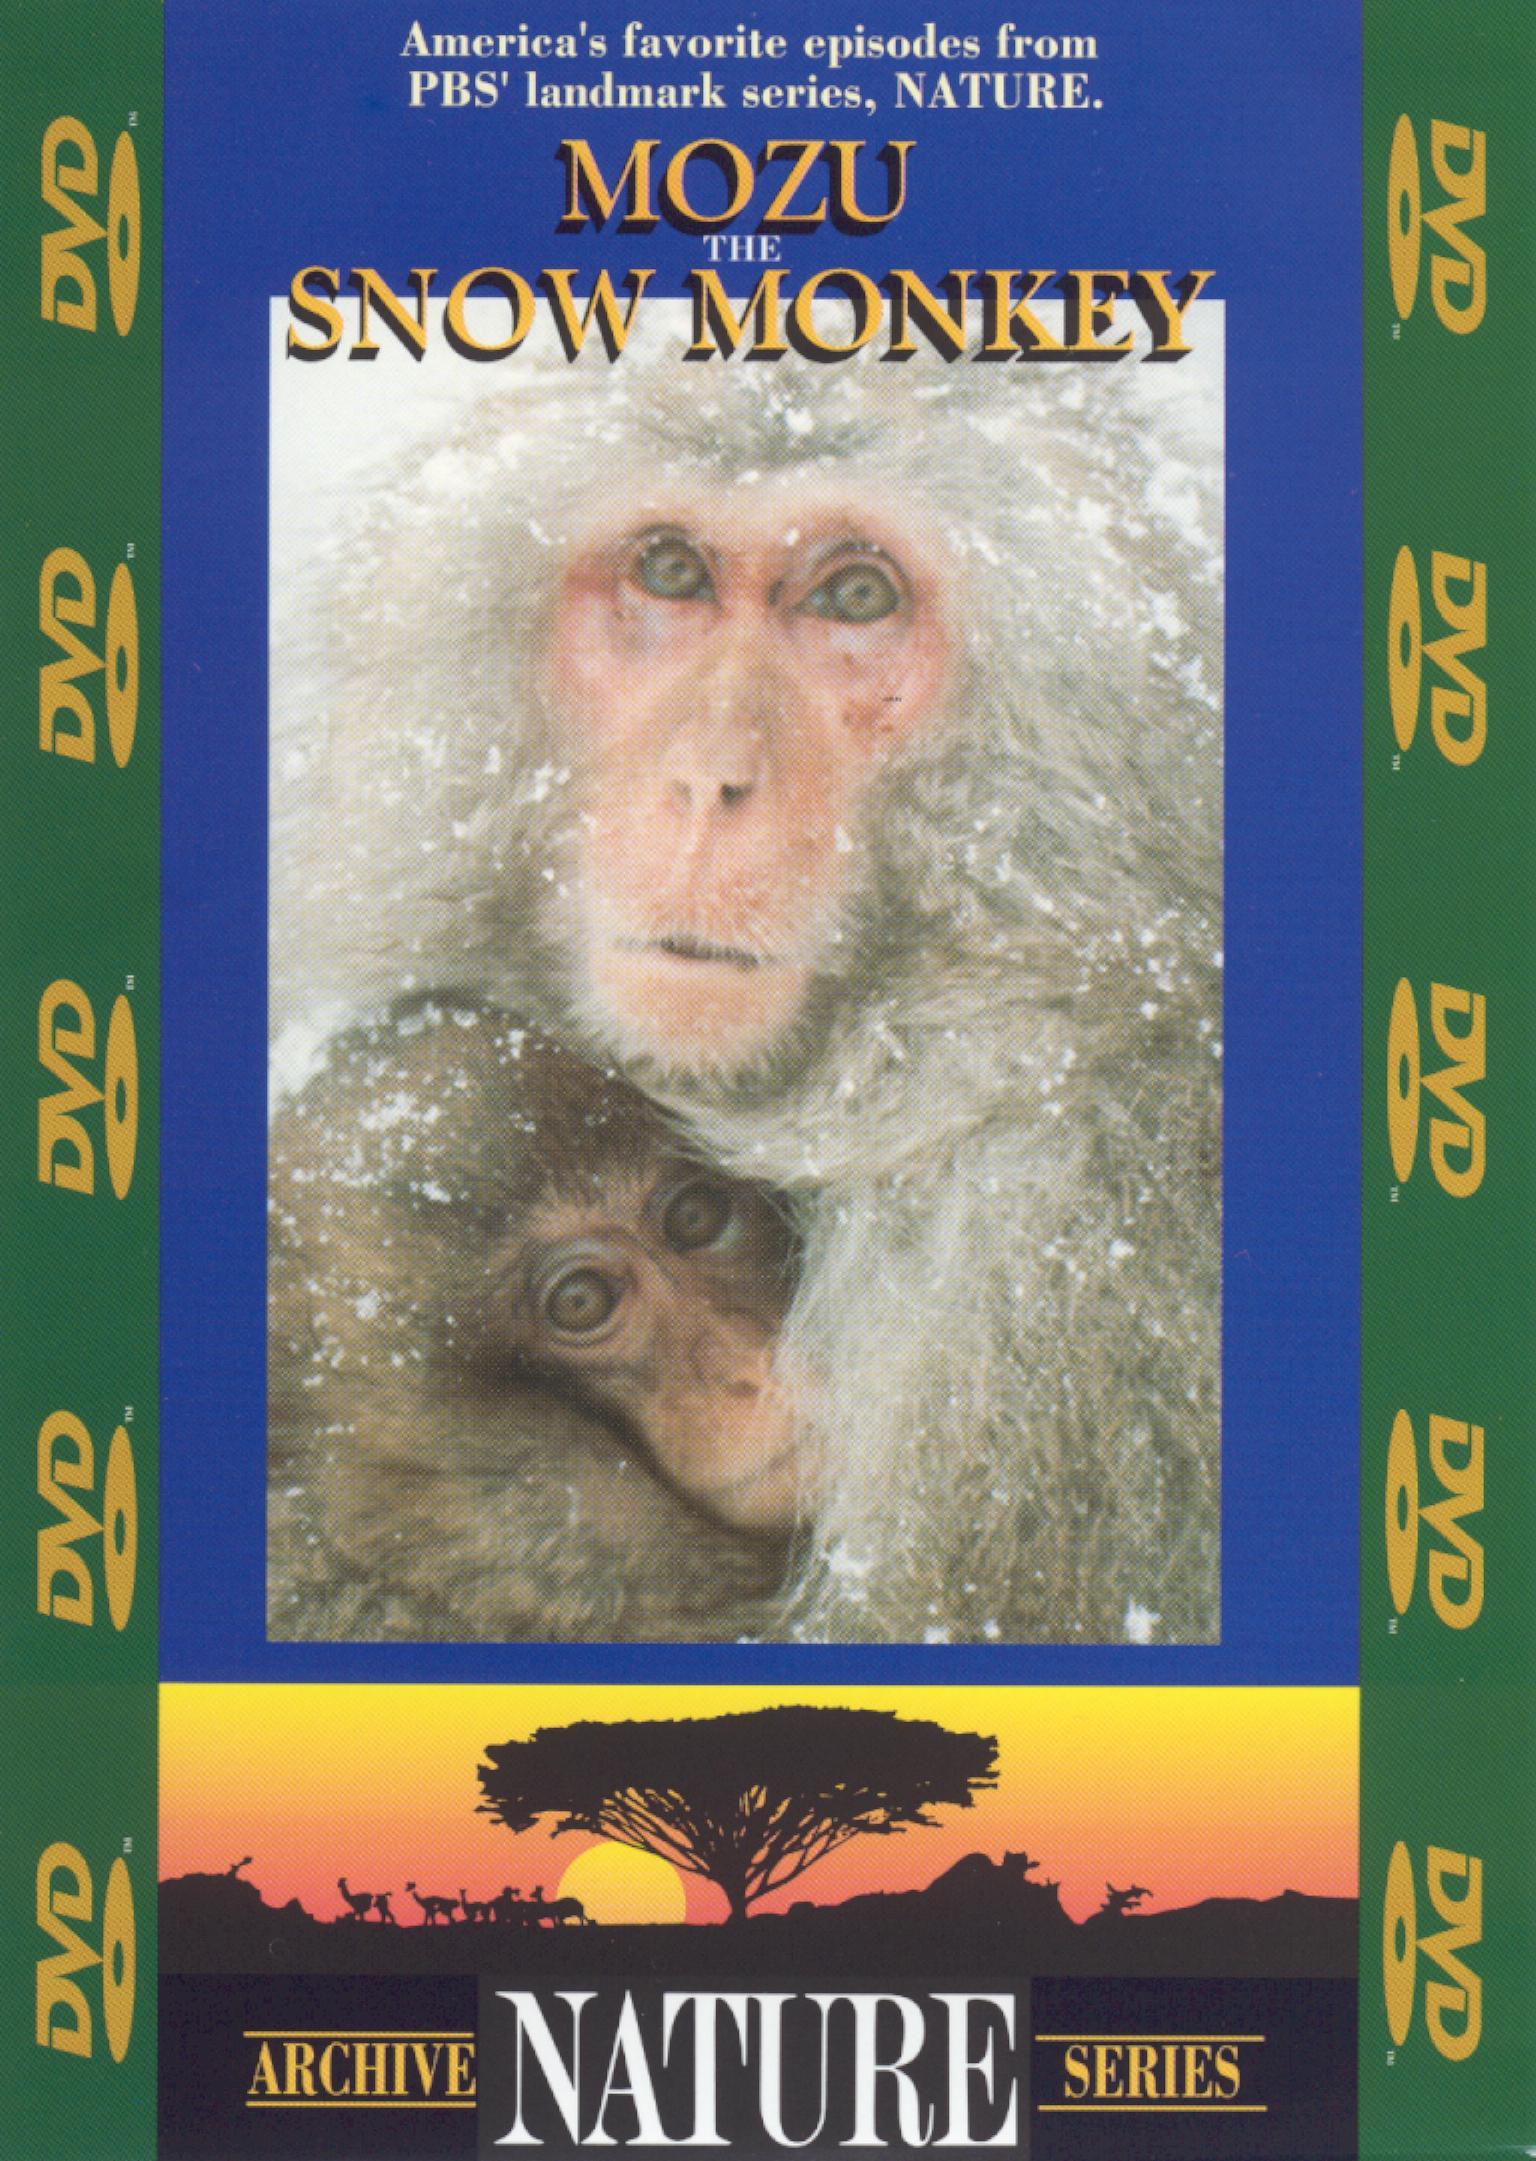 Nature: Mozu - The Snow Monkey